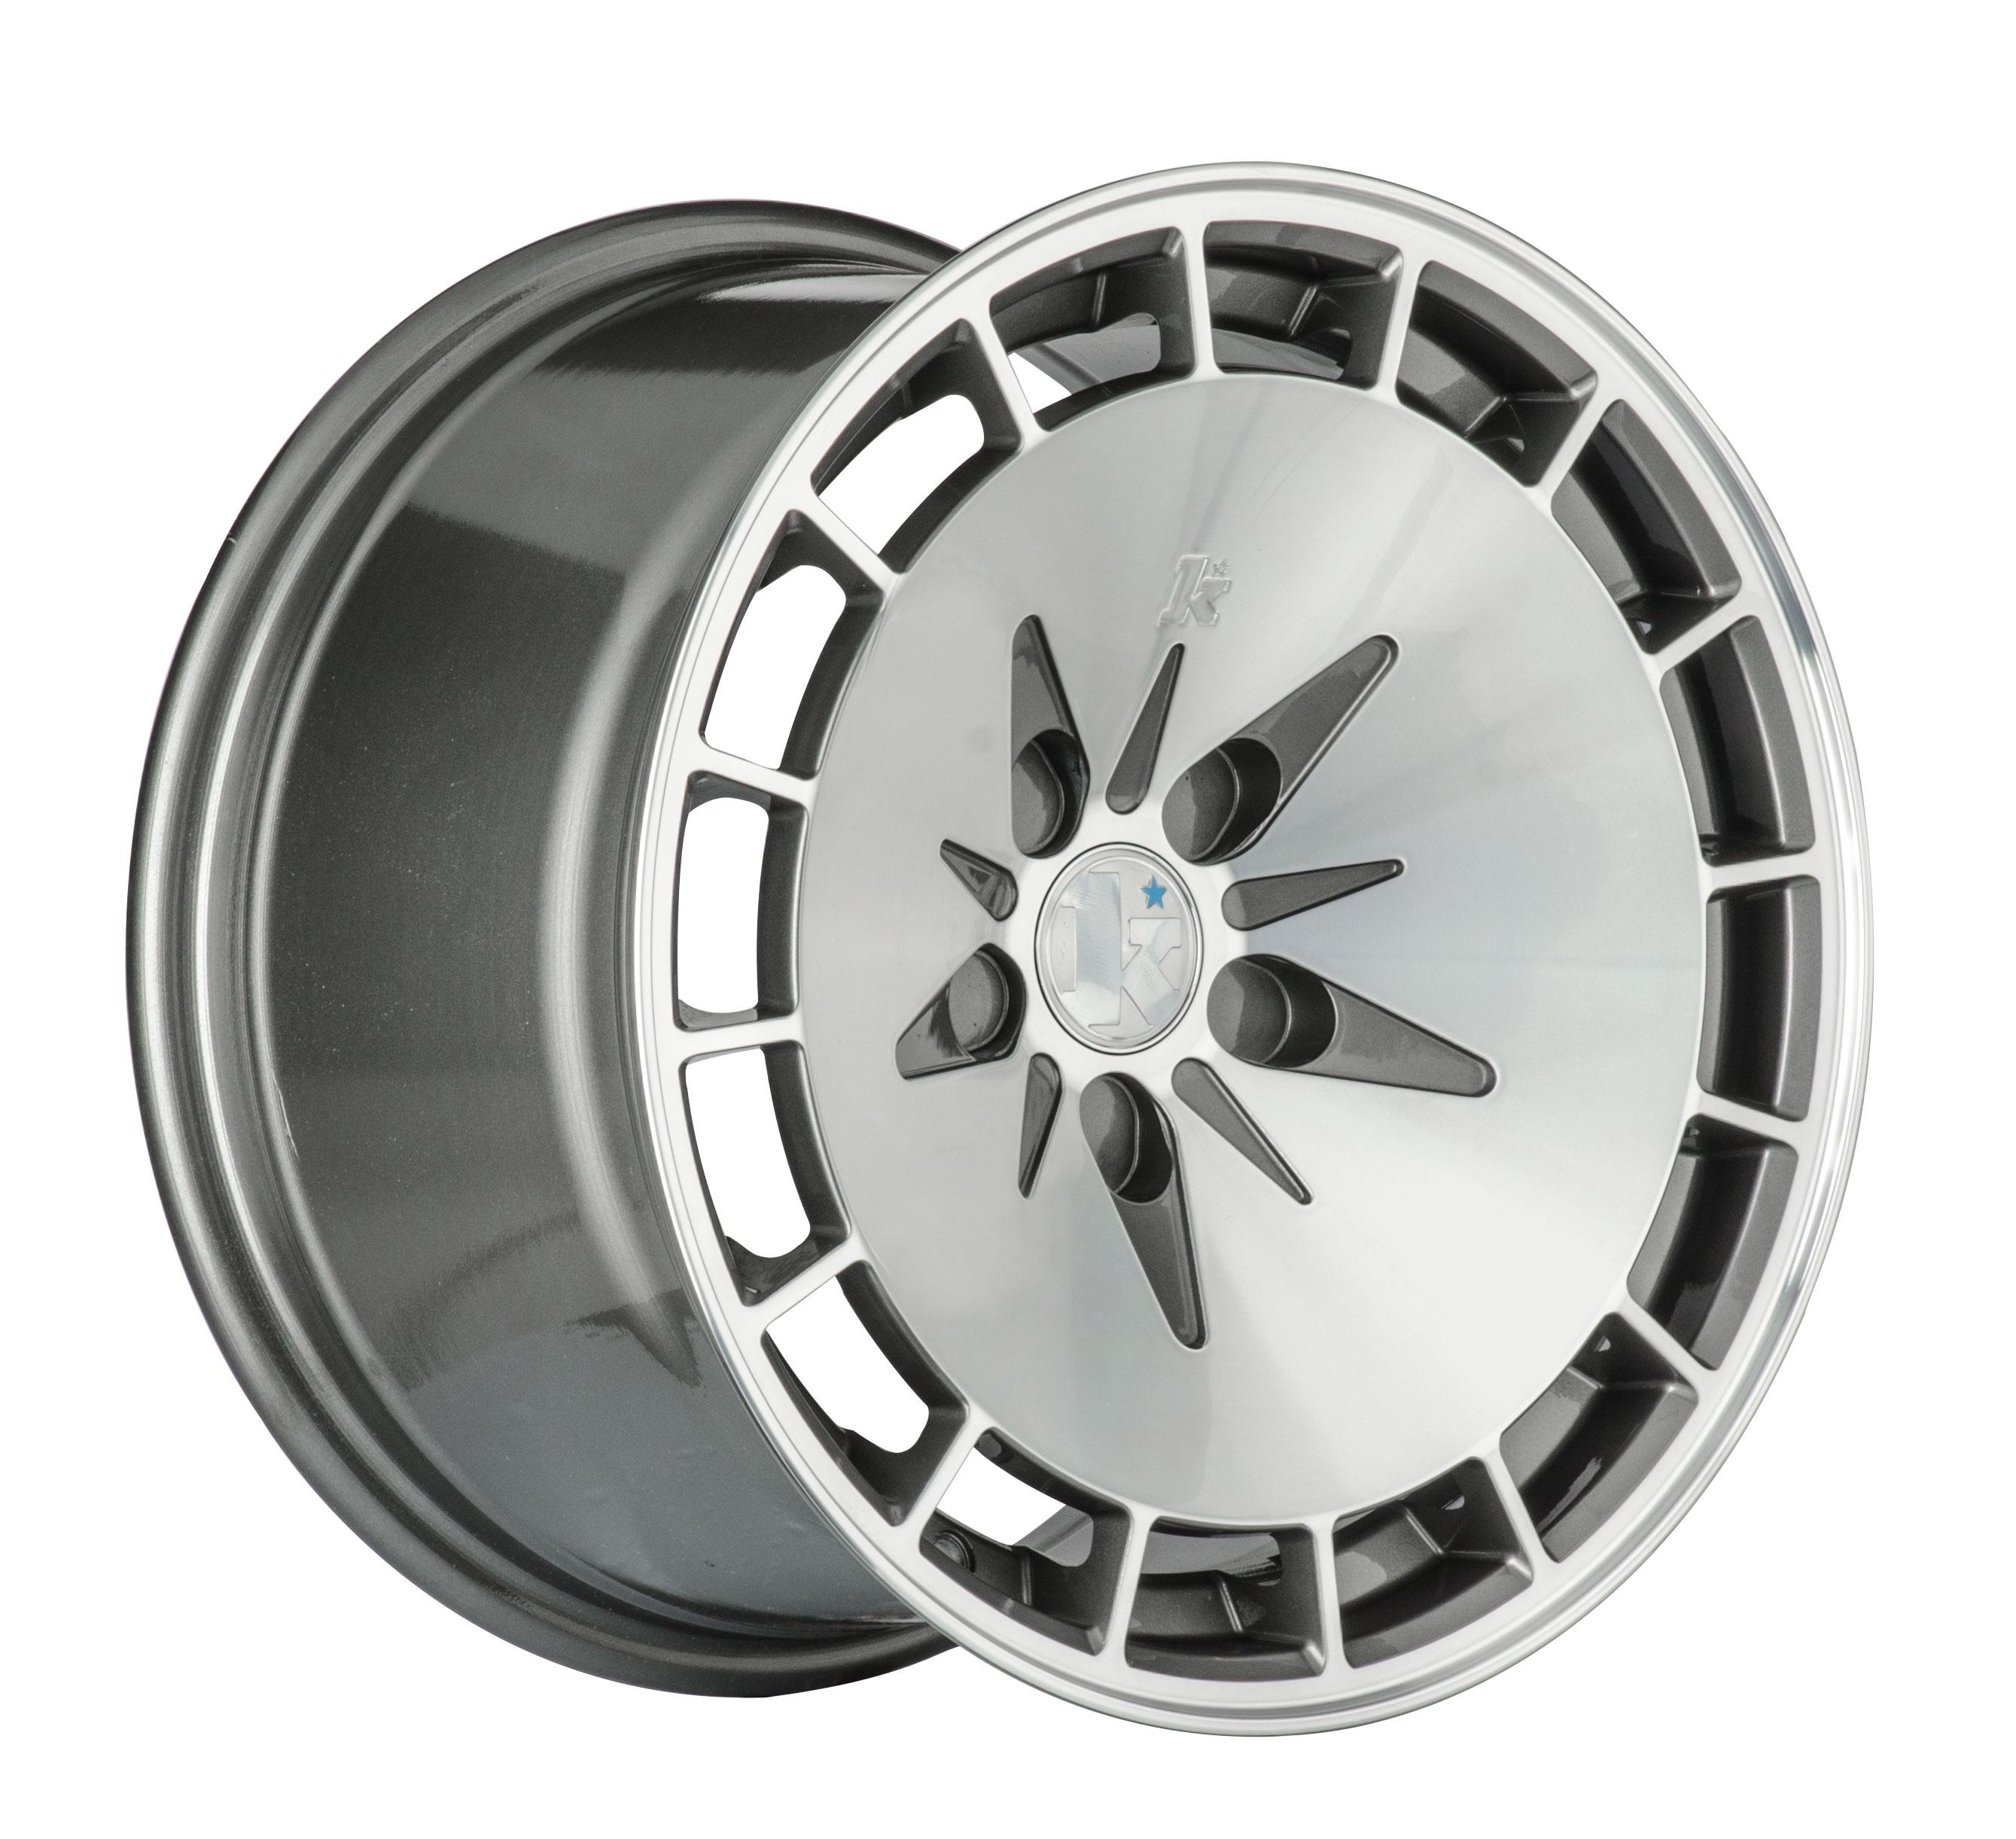 "15"" KLUTCH KM16 Wheels - Gunmetal Polished - VW / Audi - 4x100"